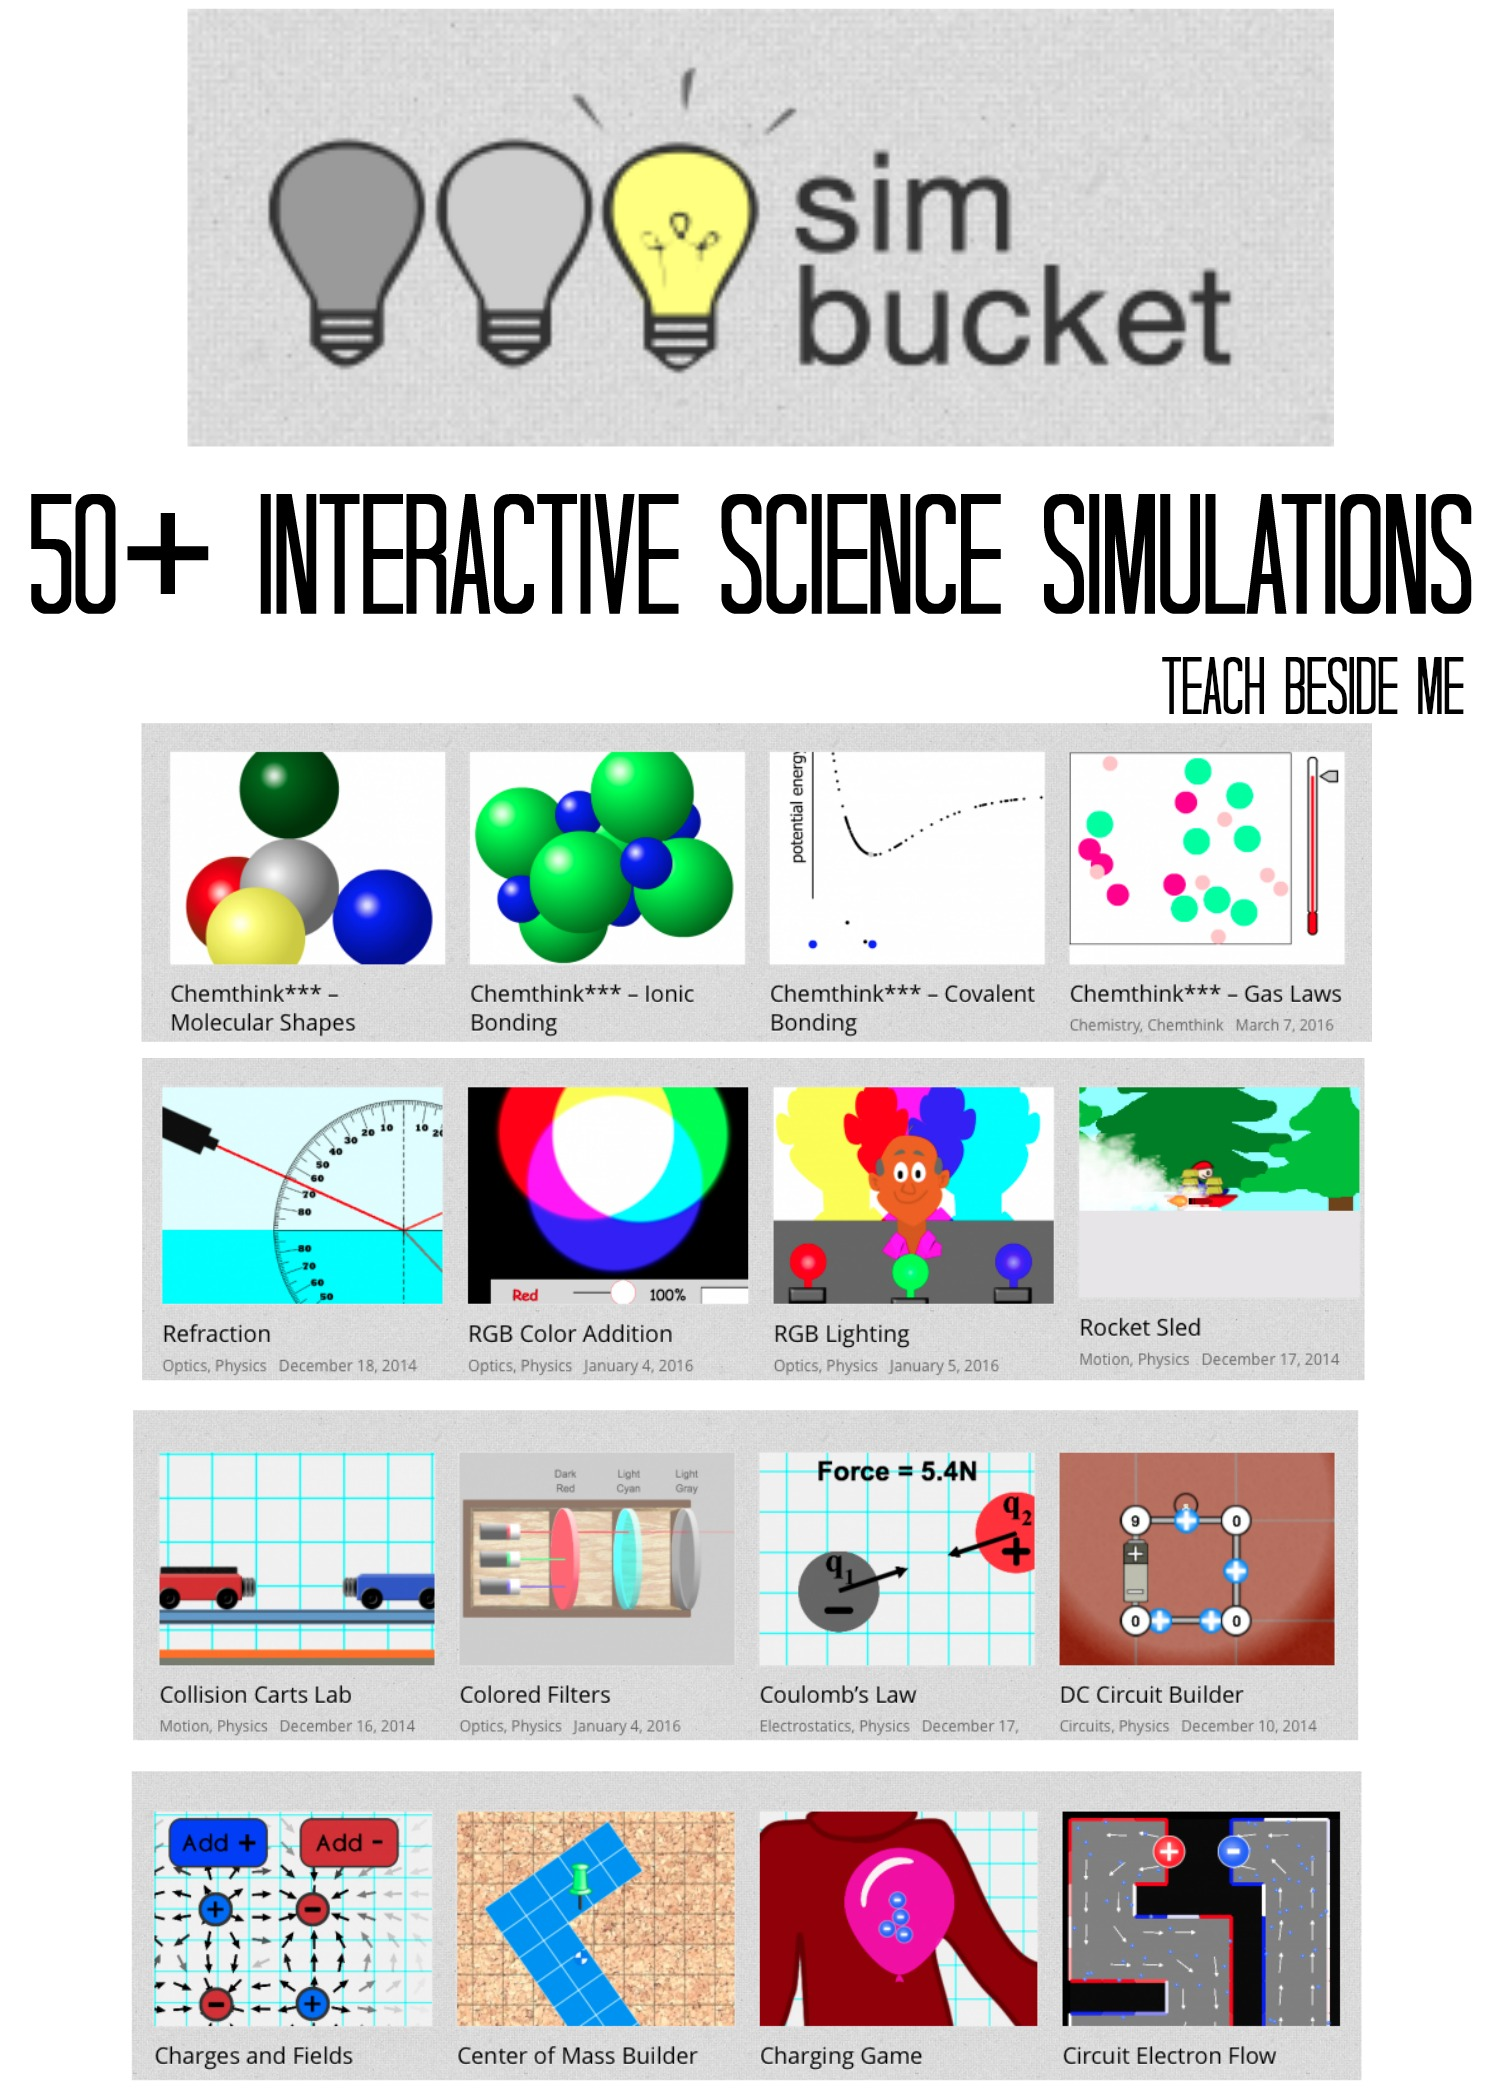 Virtual Lab: Lab Safety Simulation Virtual Lab | Labster |Science Simulations